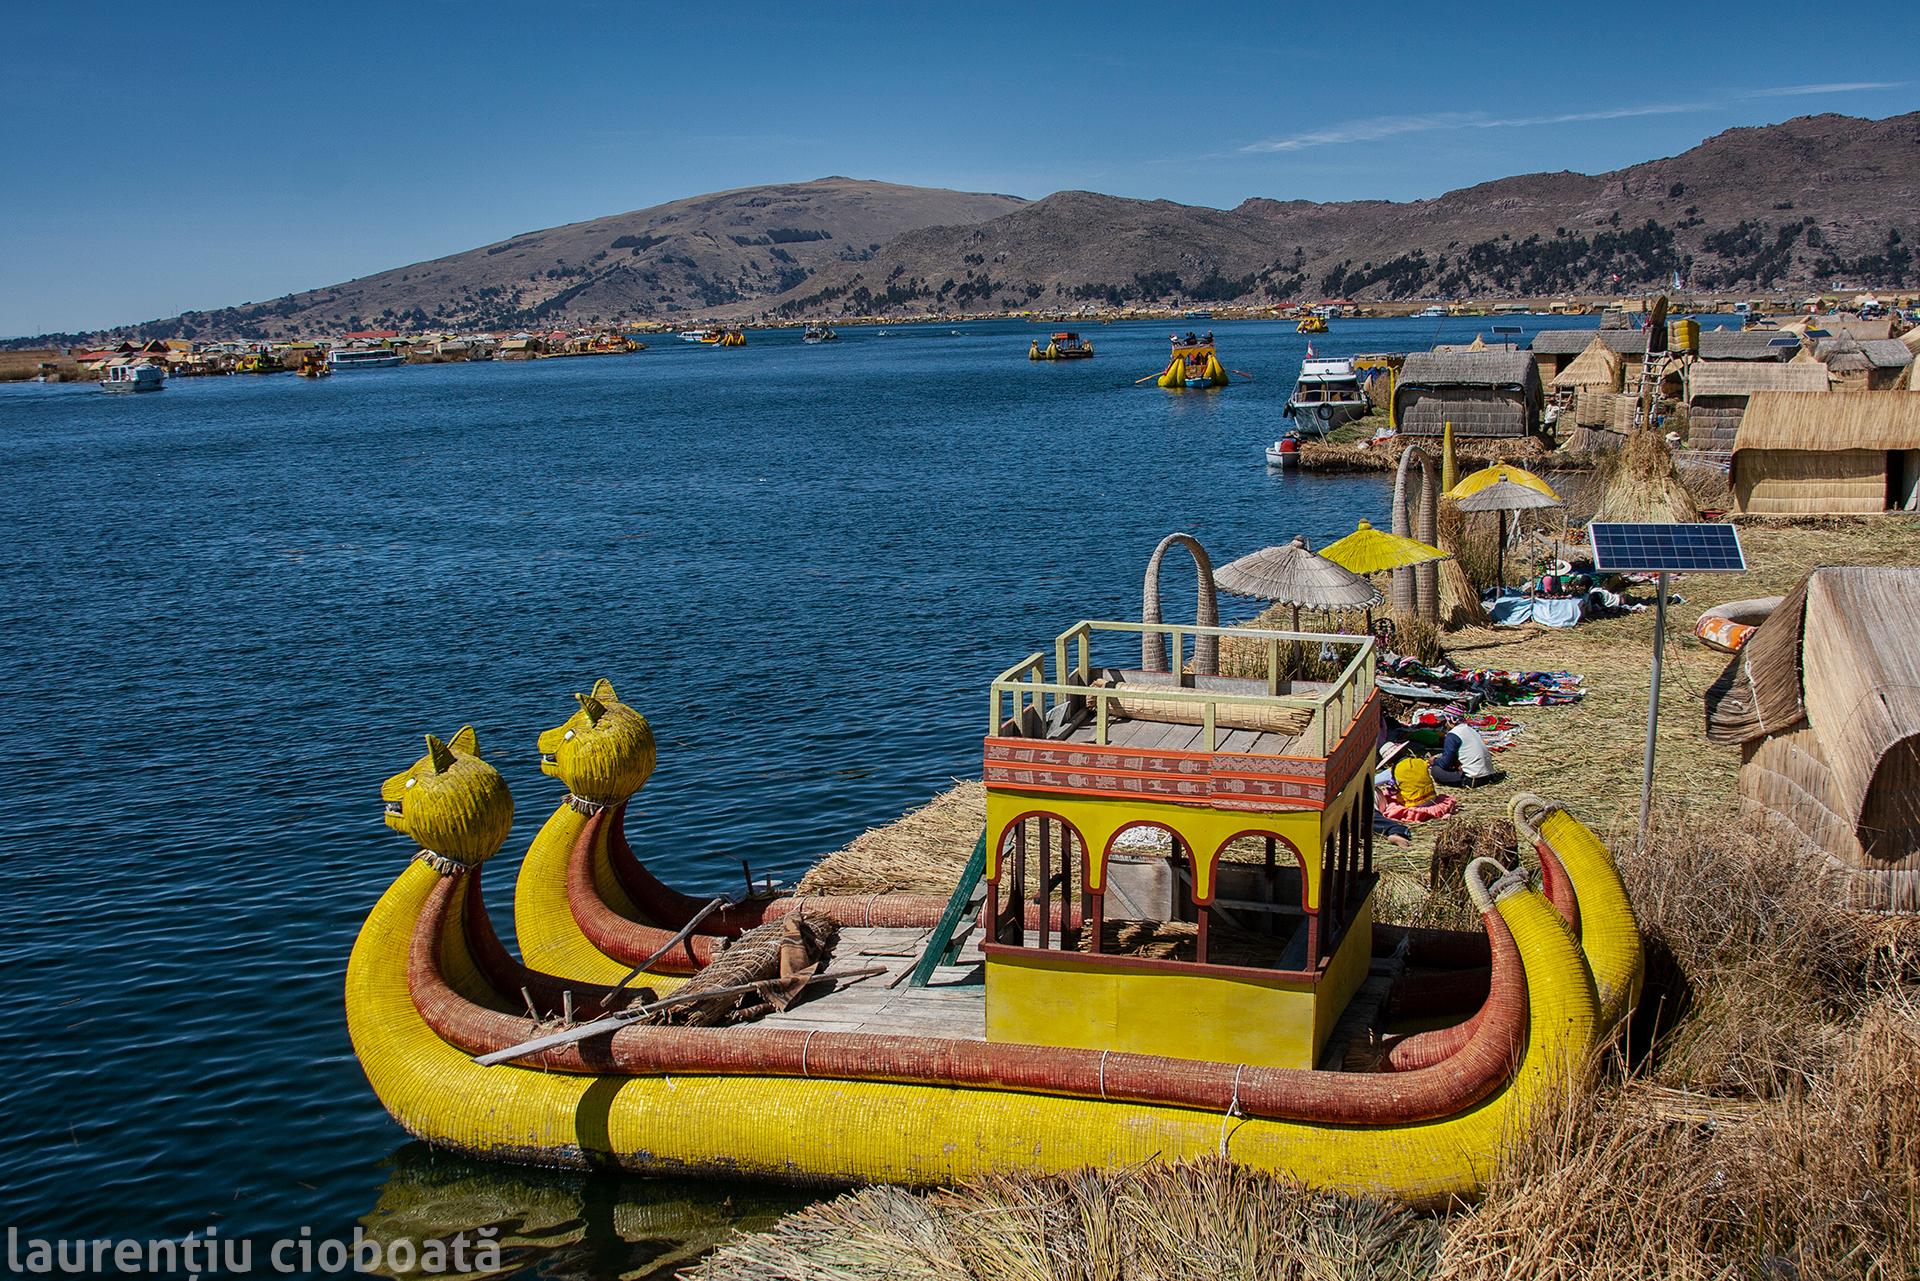 031_TiticacaLAU_0326